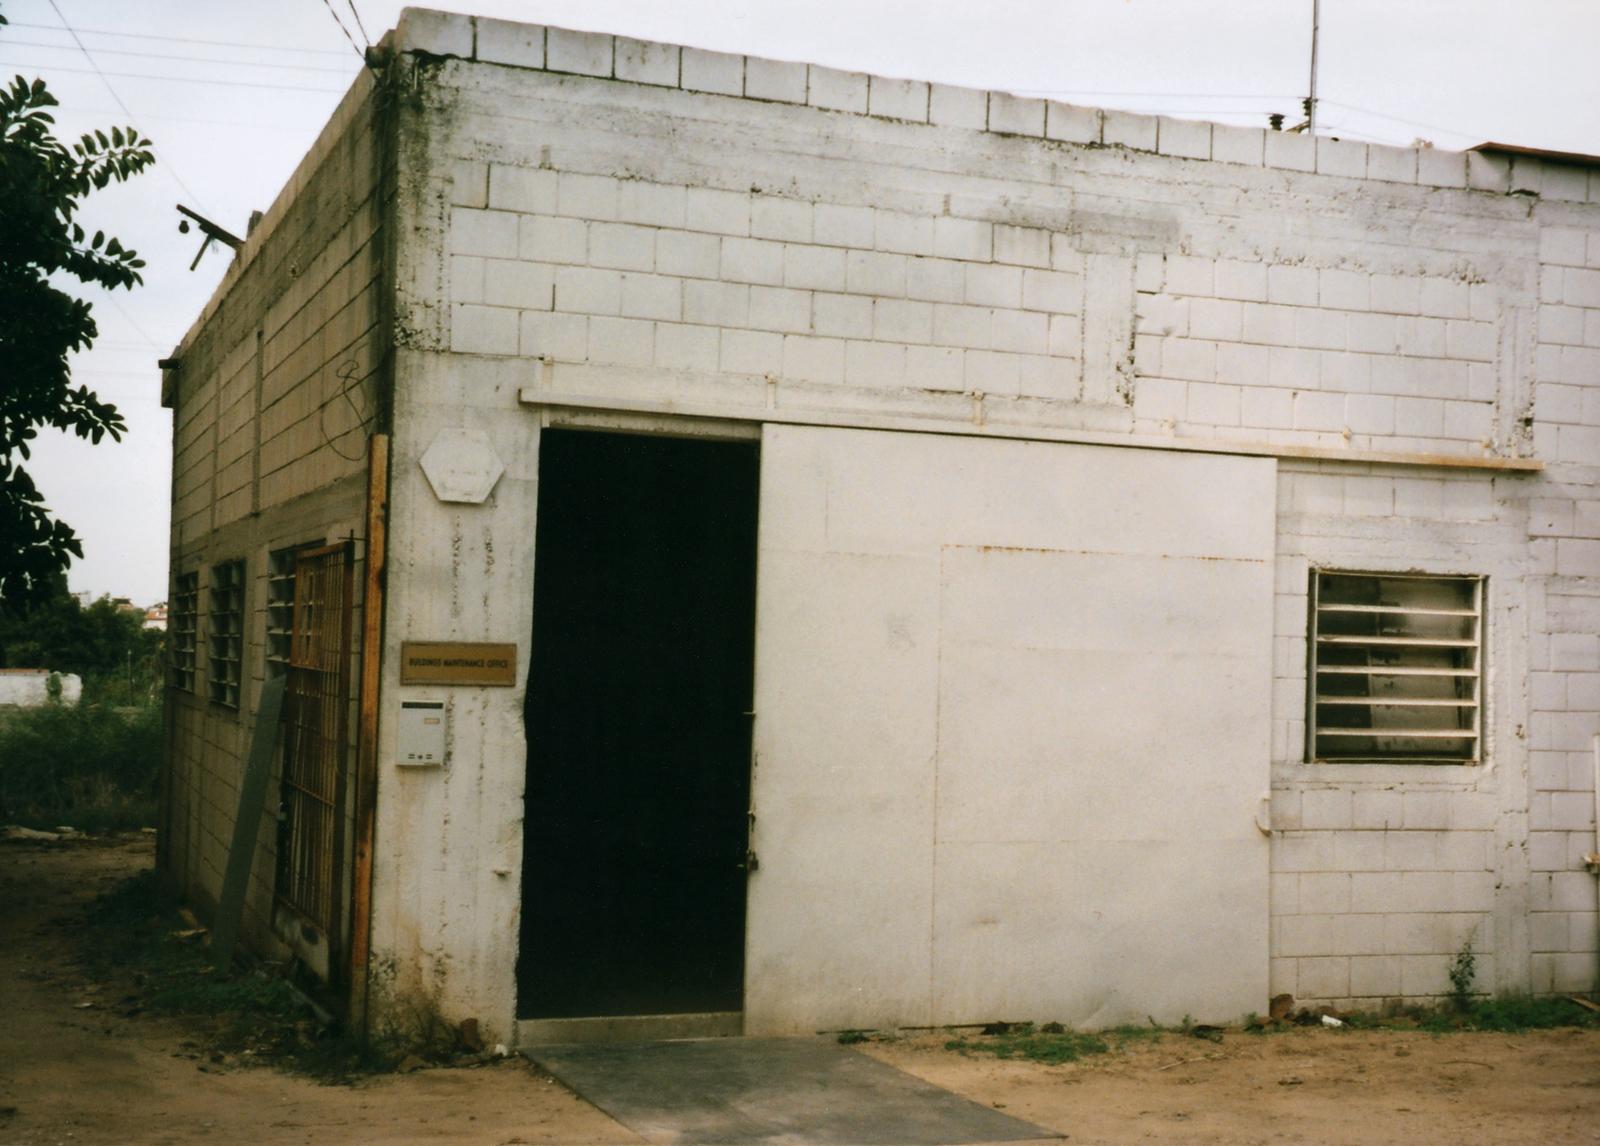 Tel Aviv - Warehouse - 1996